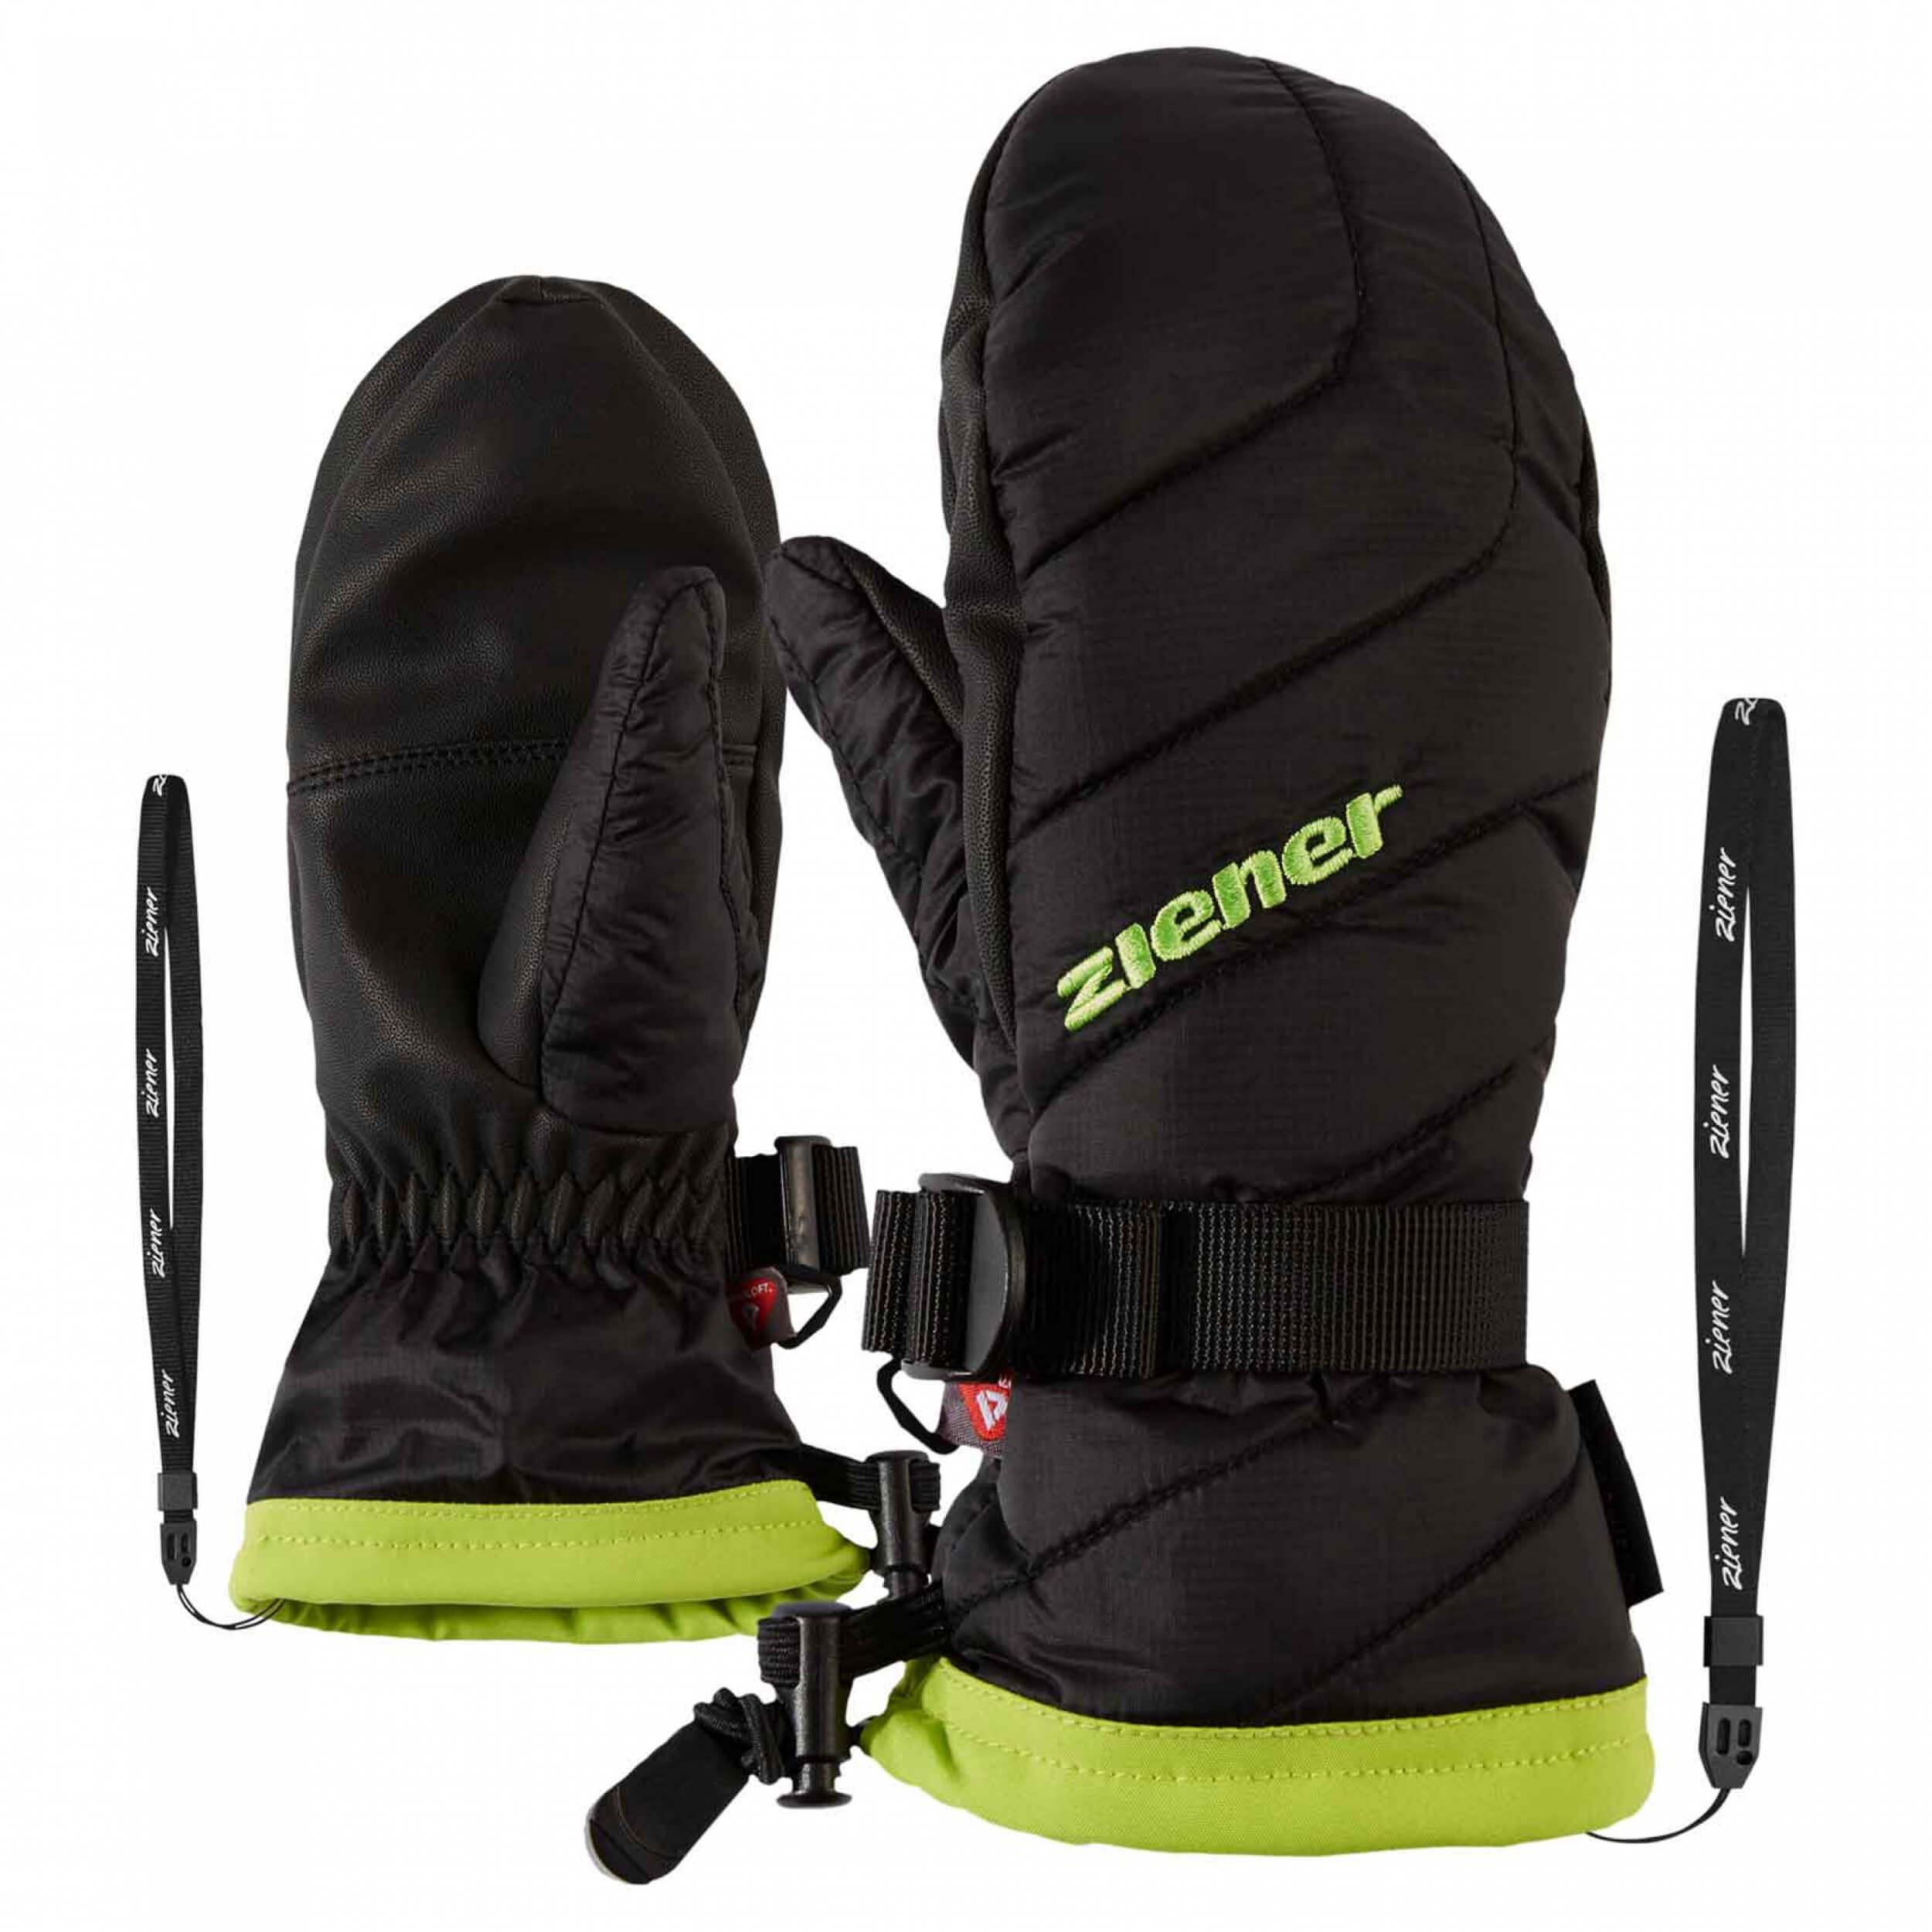 ZIENER Kinder Ski-Handschuhe Lowik AQUASHIELD schwarz 12